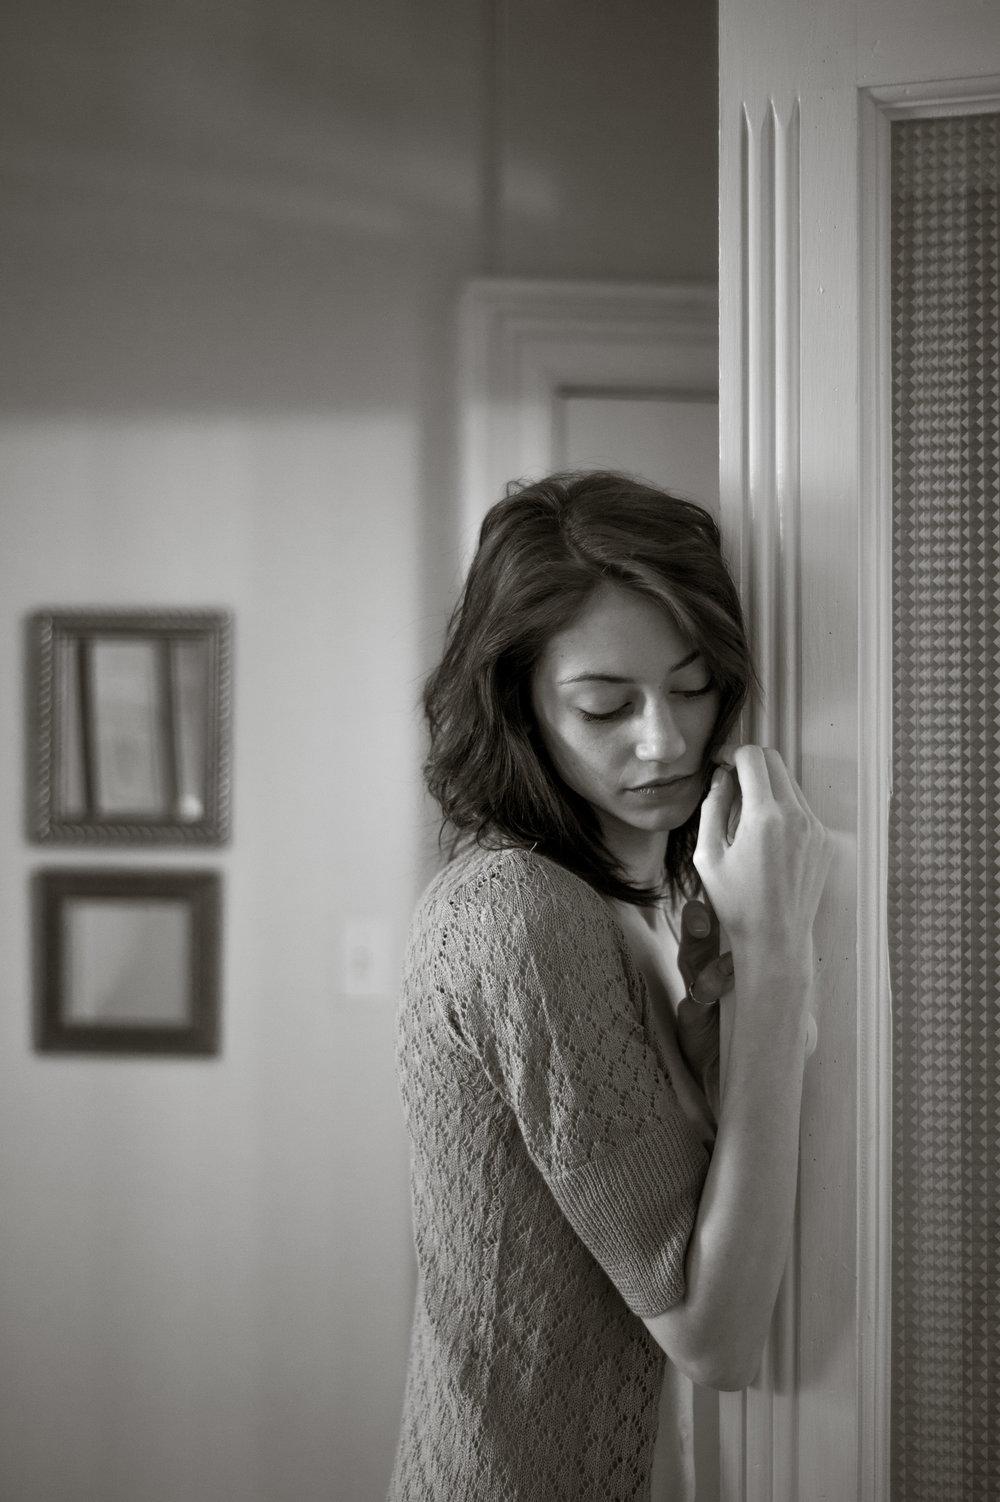 Marta-Hewson-Lifestyle-portrait-Maggie-Mae-Taylor-resting-on-door.jpg